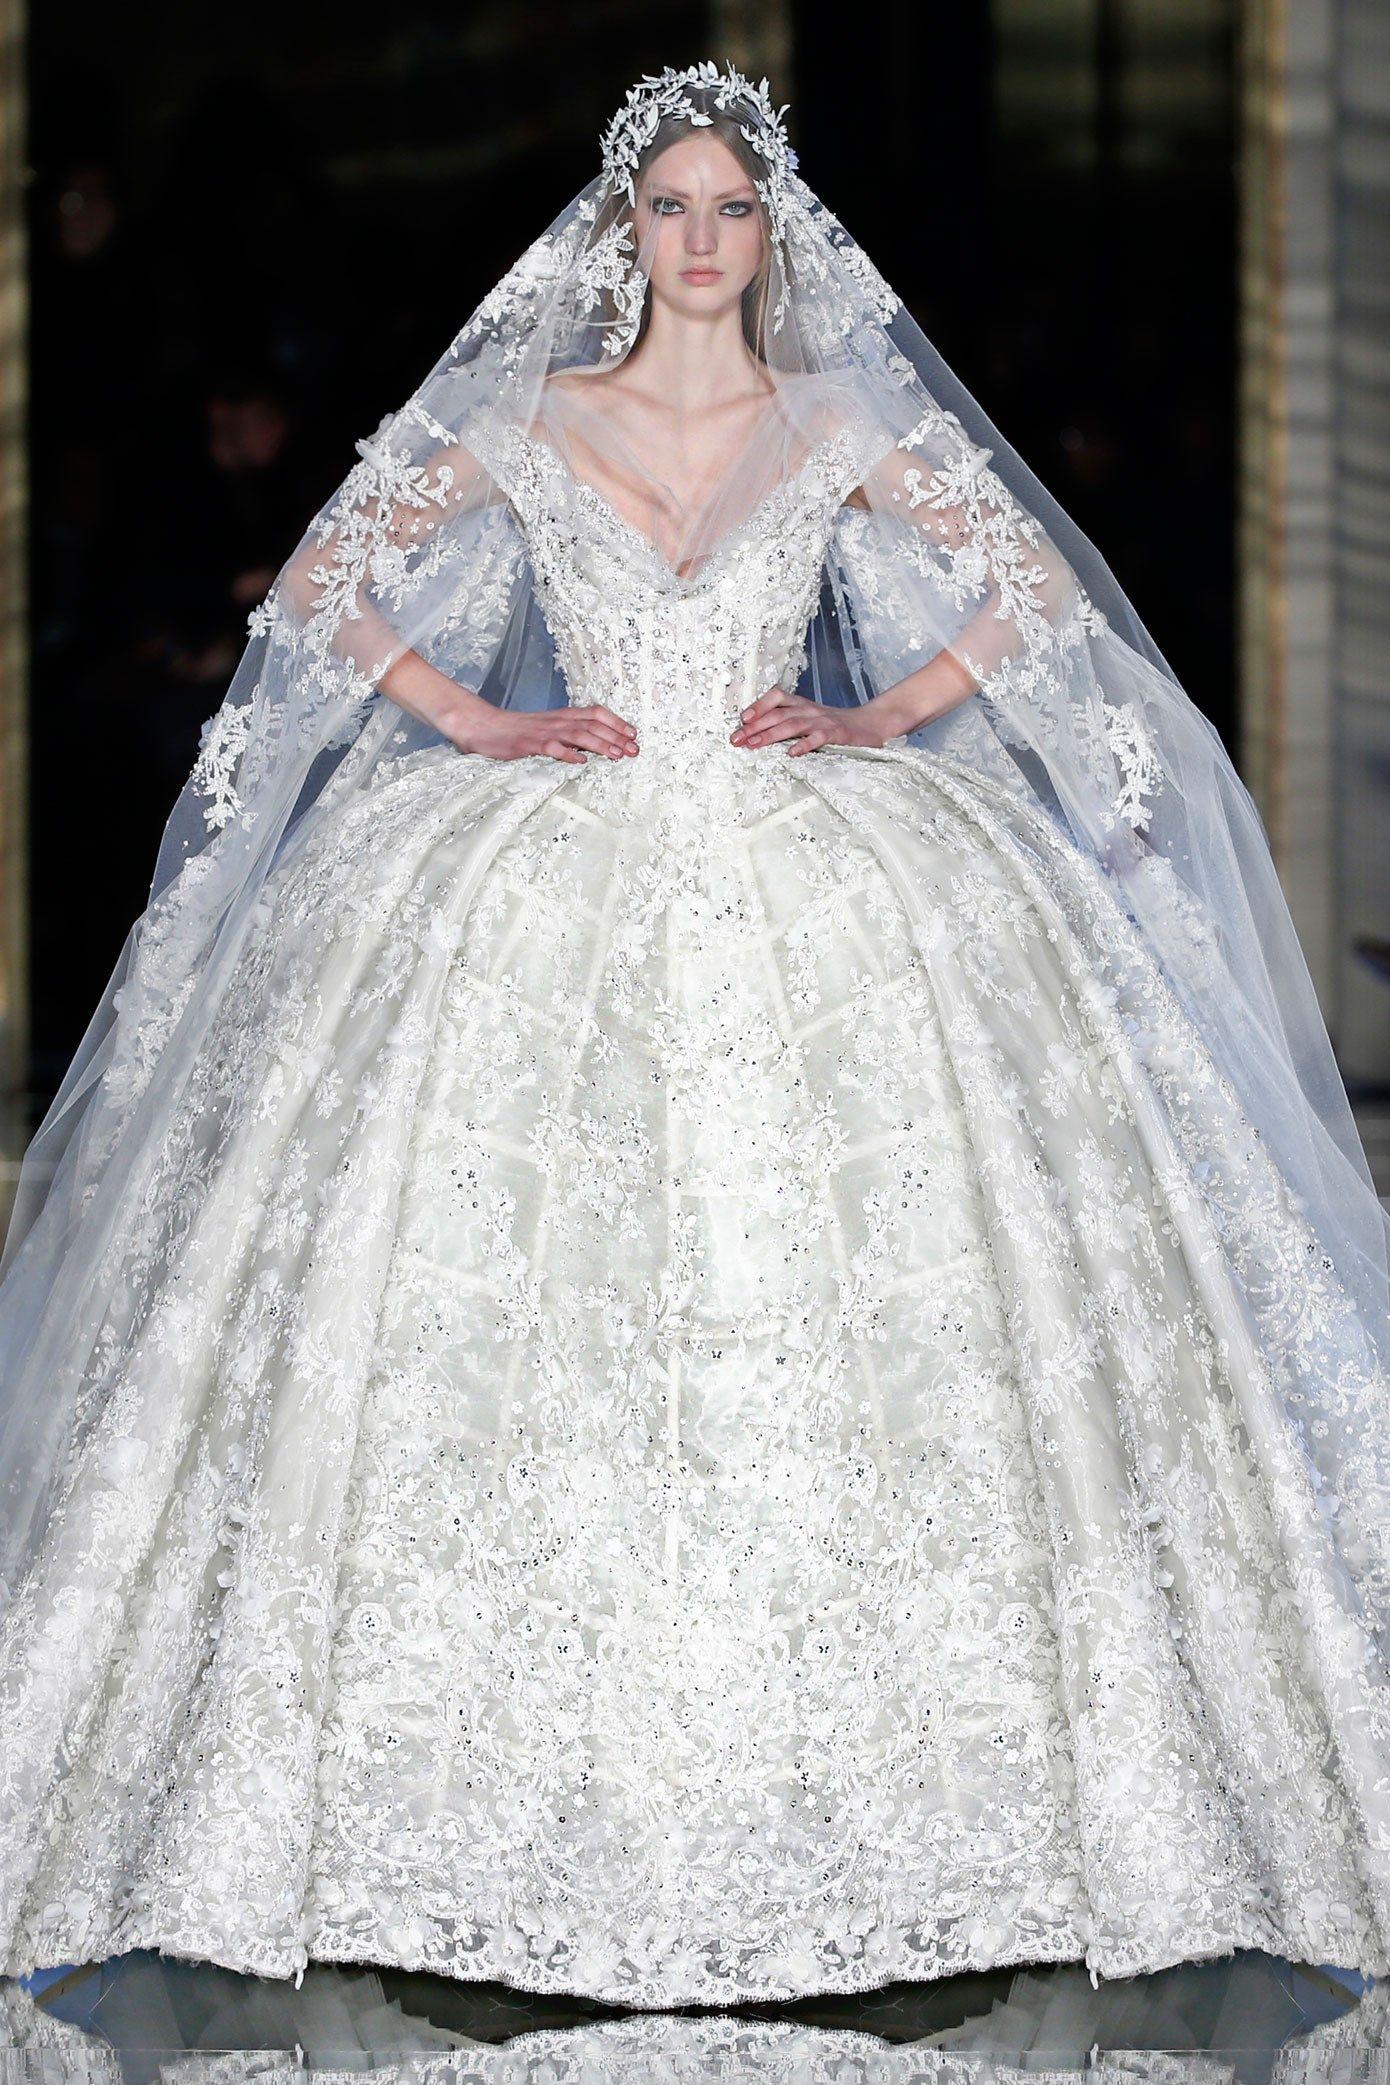 Zuhair murad couture springsummer bridal gown in white tulle